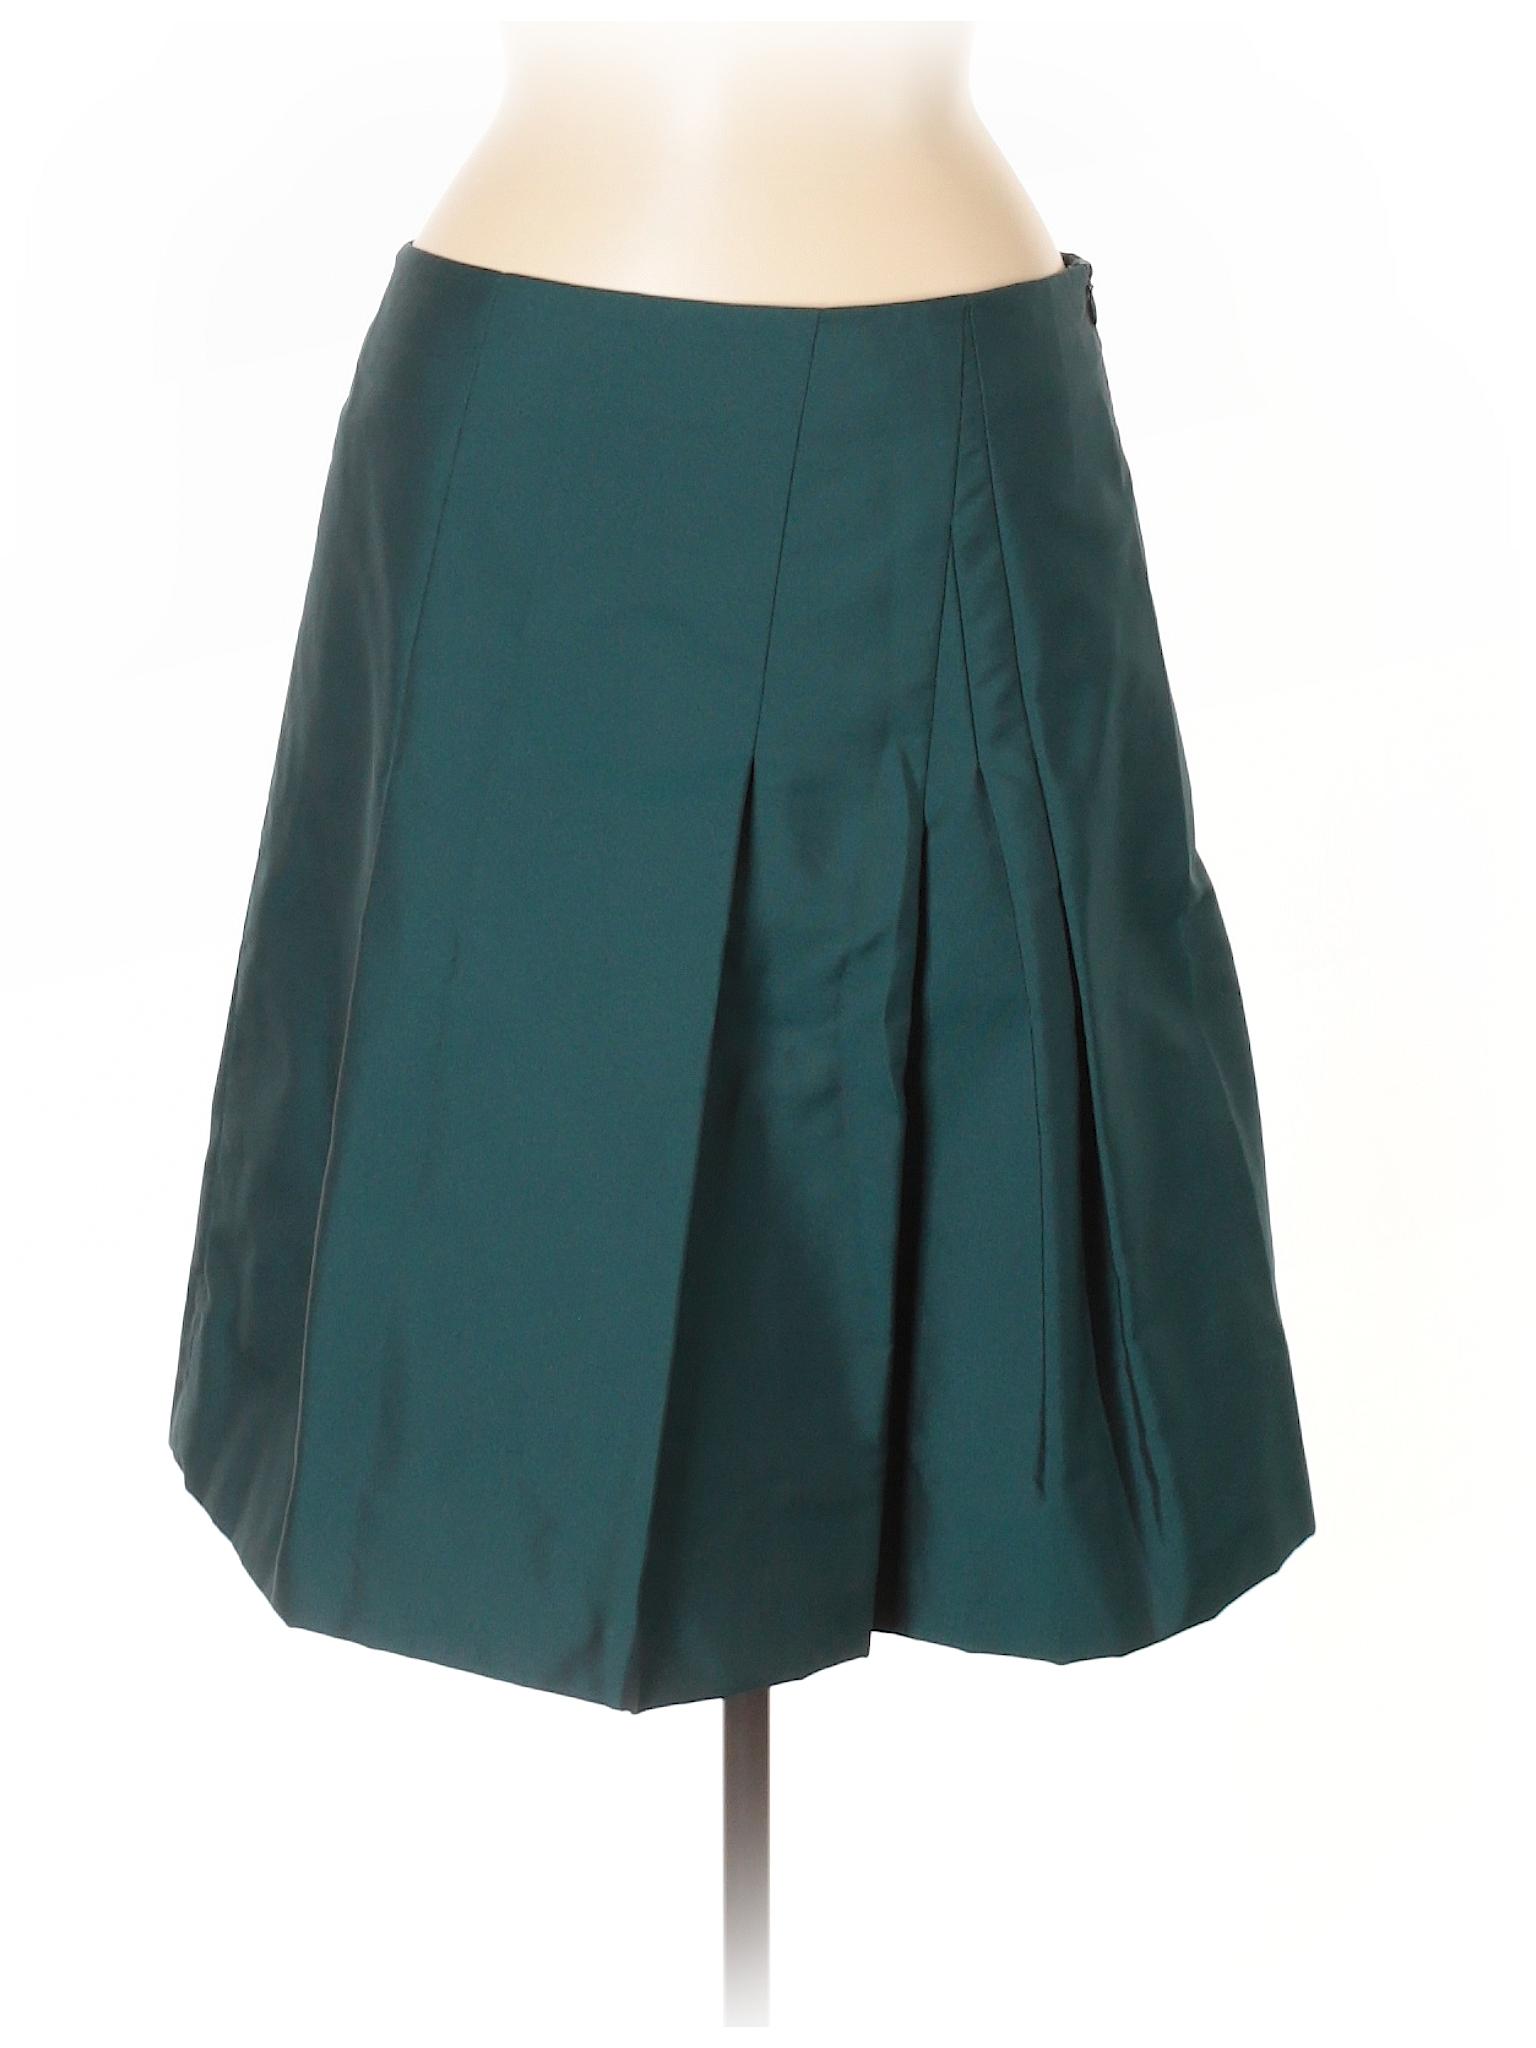 Boutique Skirt Silk Silk Boutique rHfrzwqPx